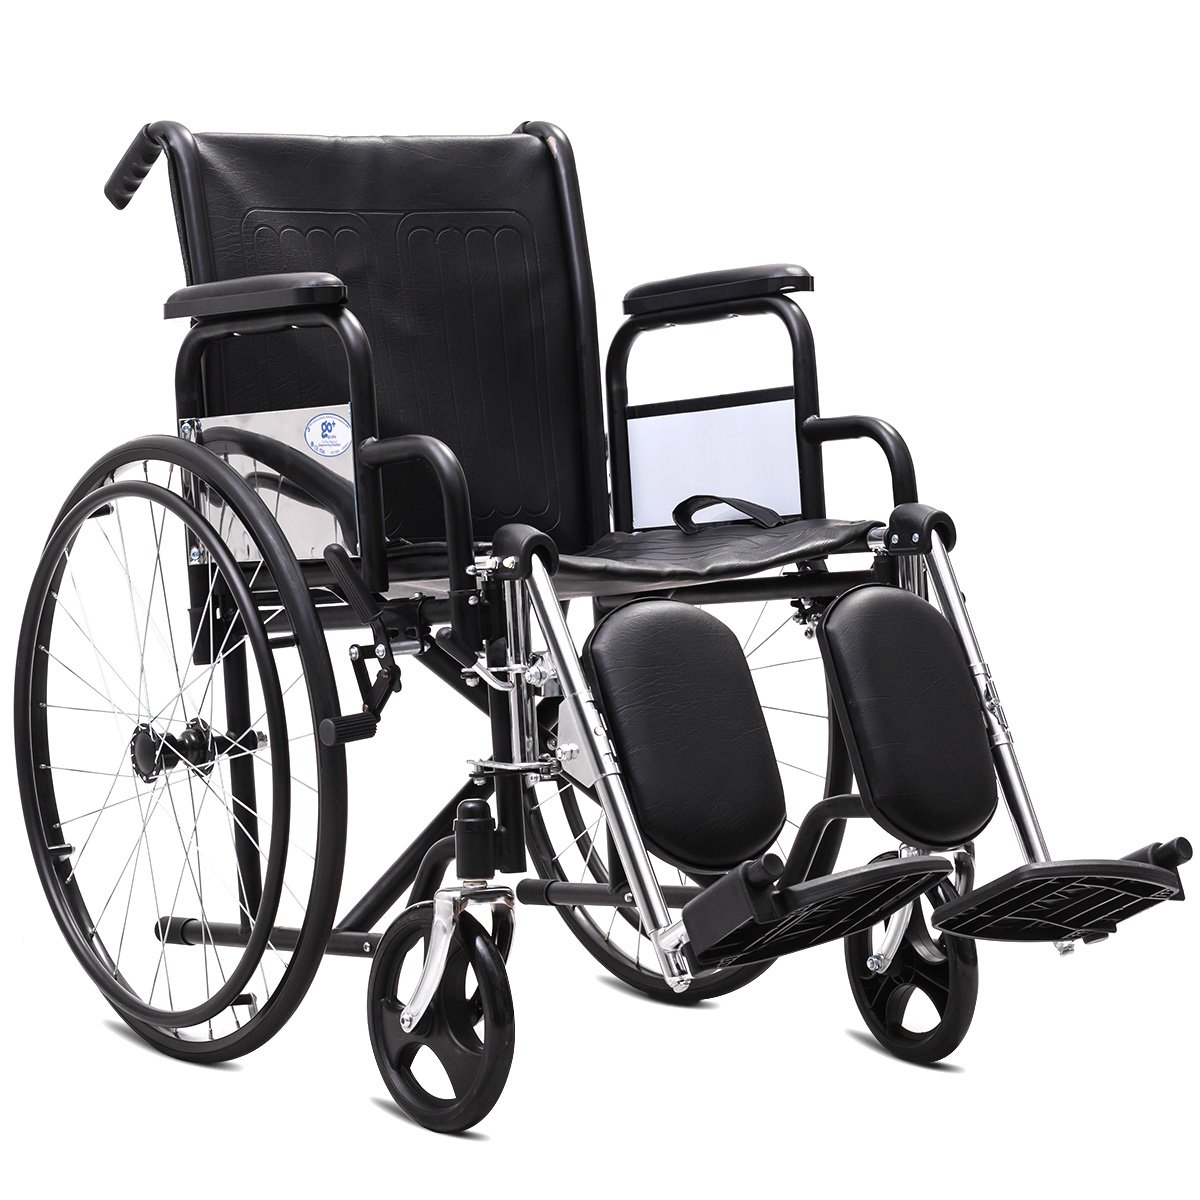 Giantex Manual Folding Medical Transport Wheelchair w/ Footrest Handbrakes Lightweight Wheelchairs (Elevating Leg Rests)